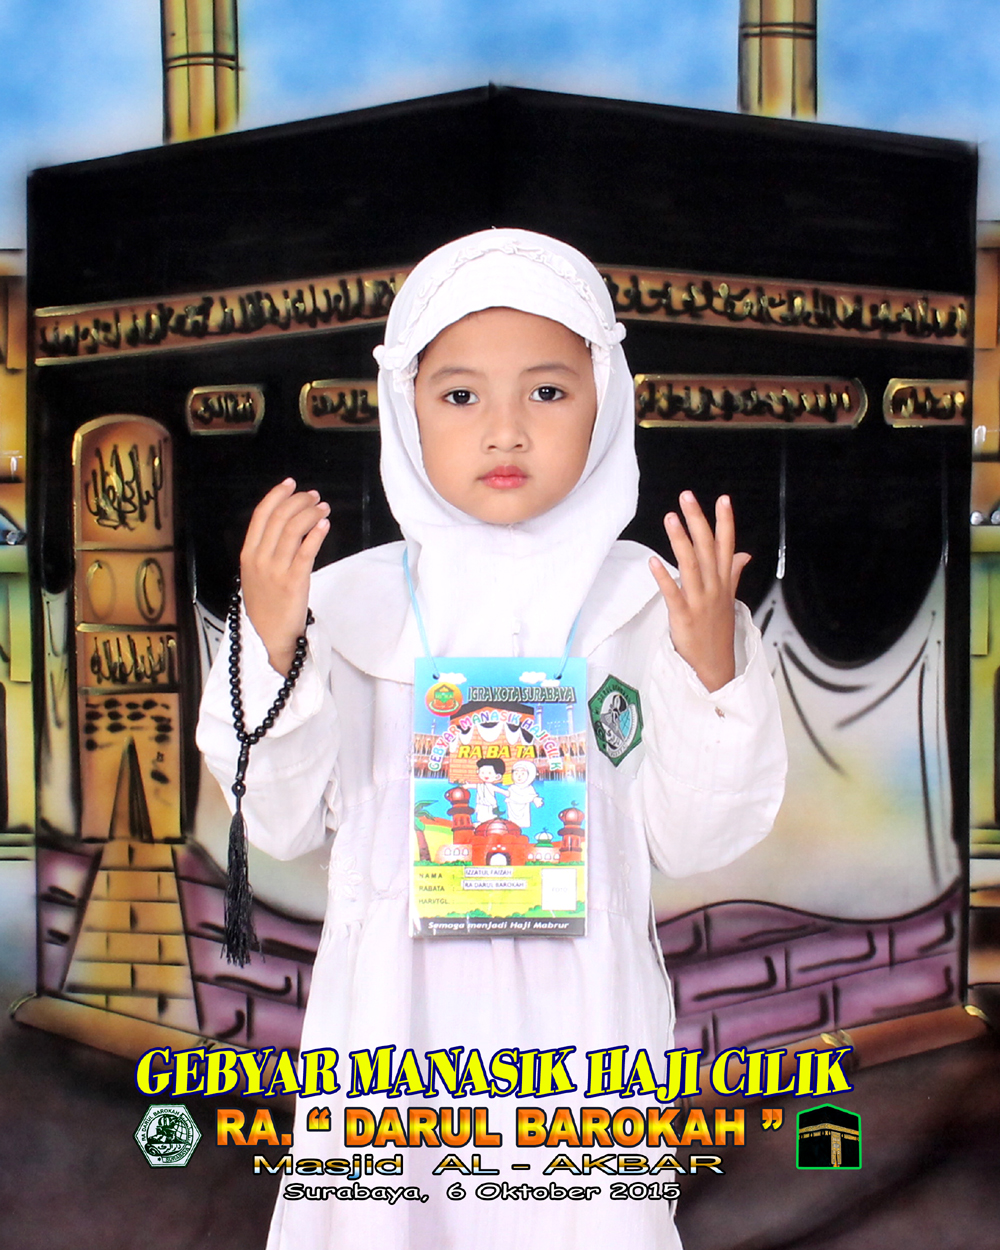 Gambar Orang Manasik Haji Background Foto 25x3m Pro Art Photo Video Studio Anak